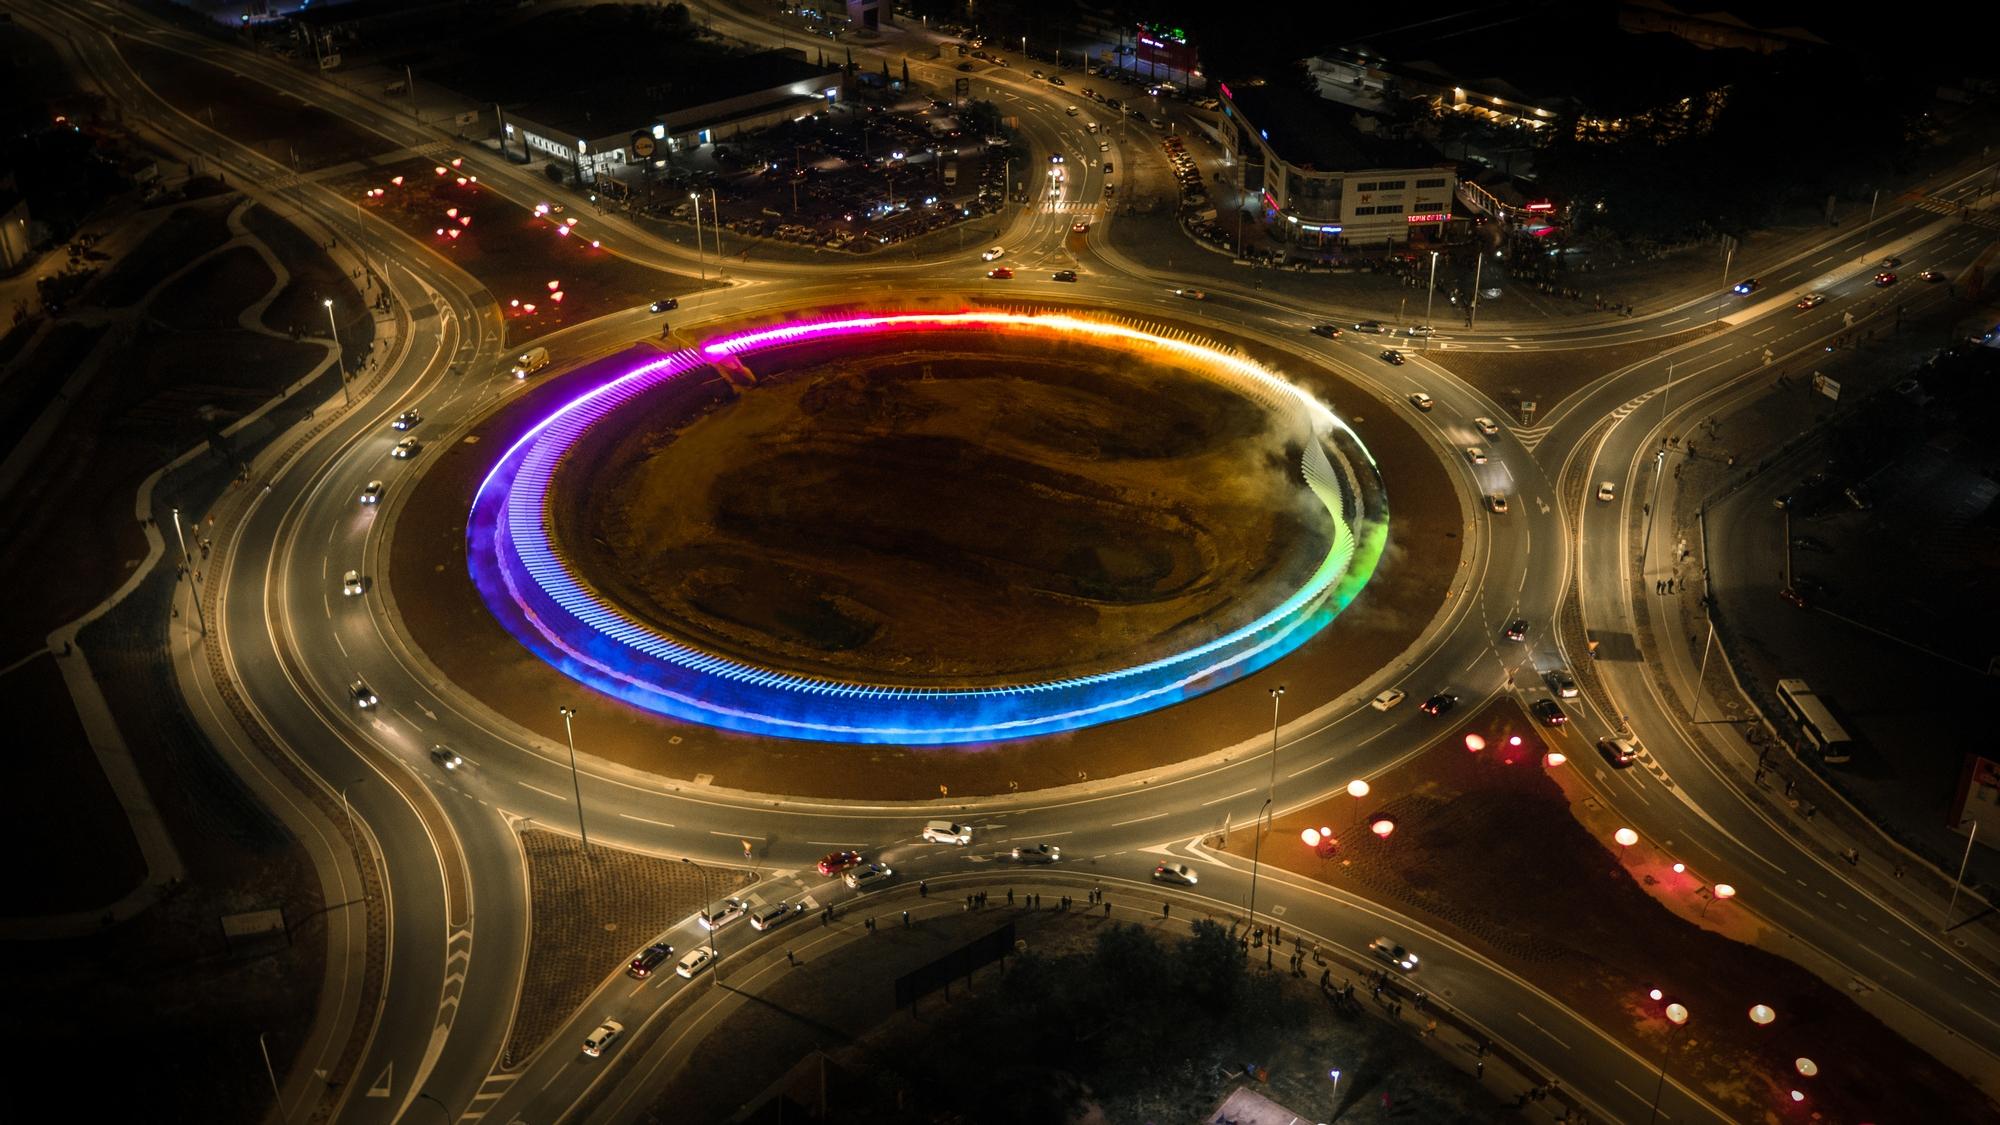 Croatian Roundabout Project Wins At Lighting Design Awards